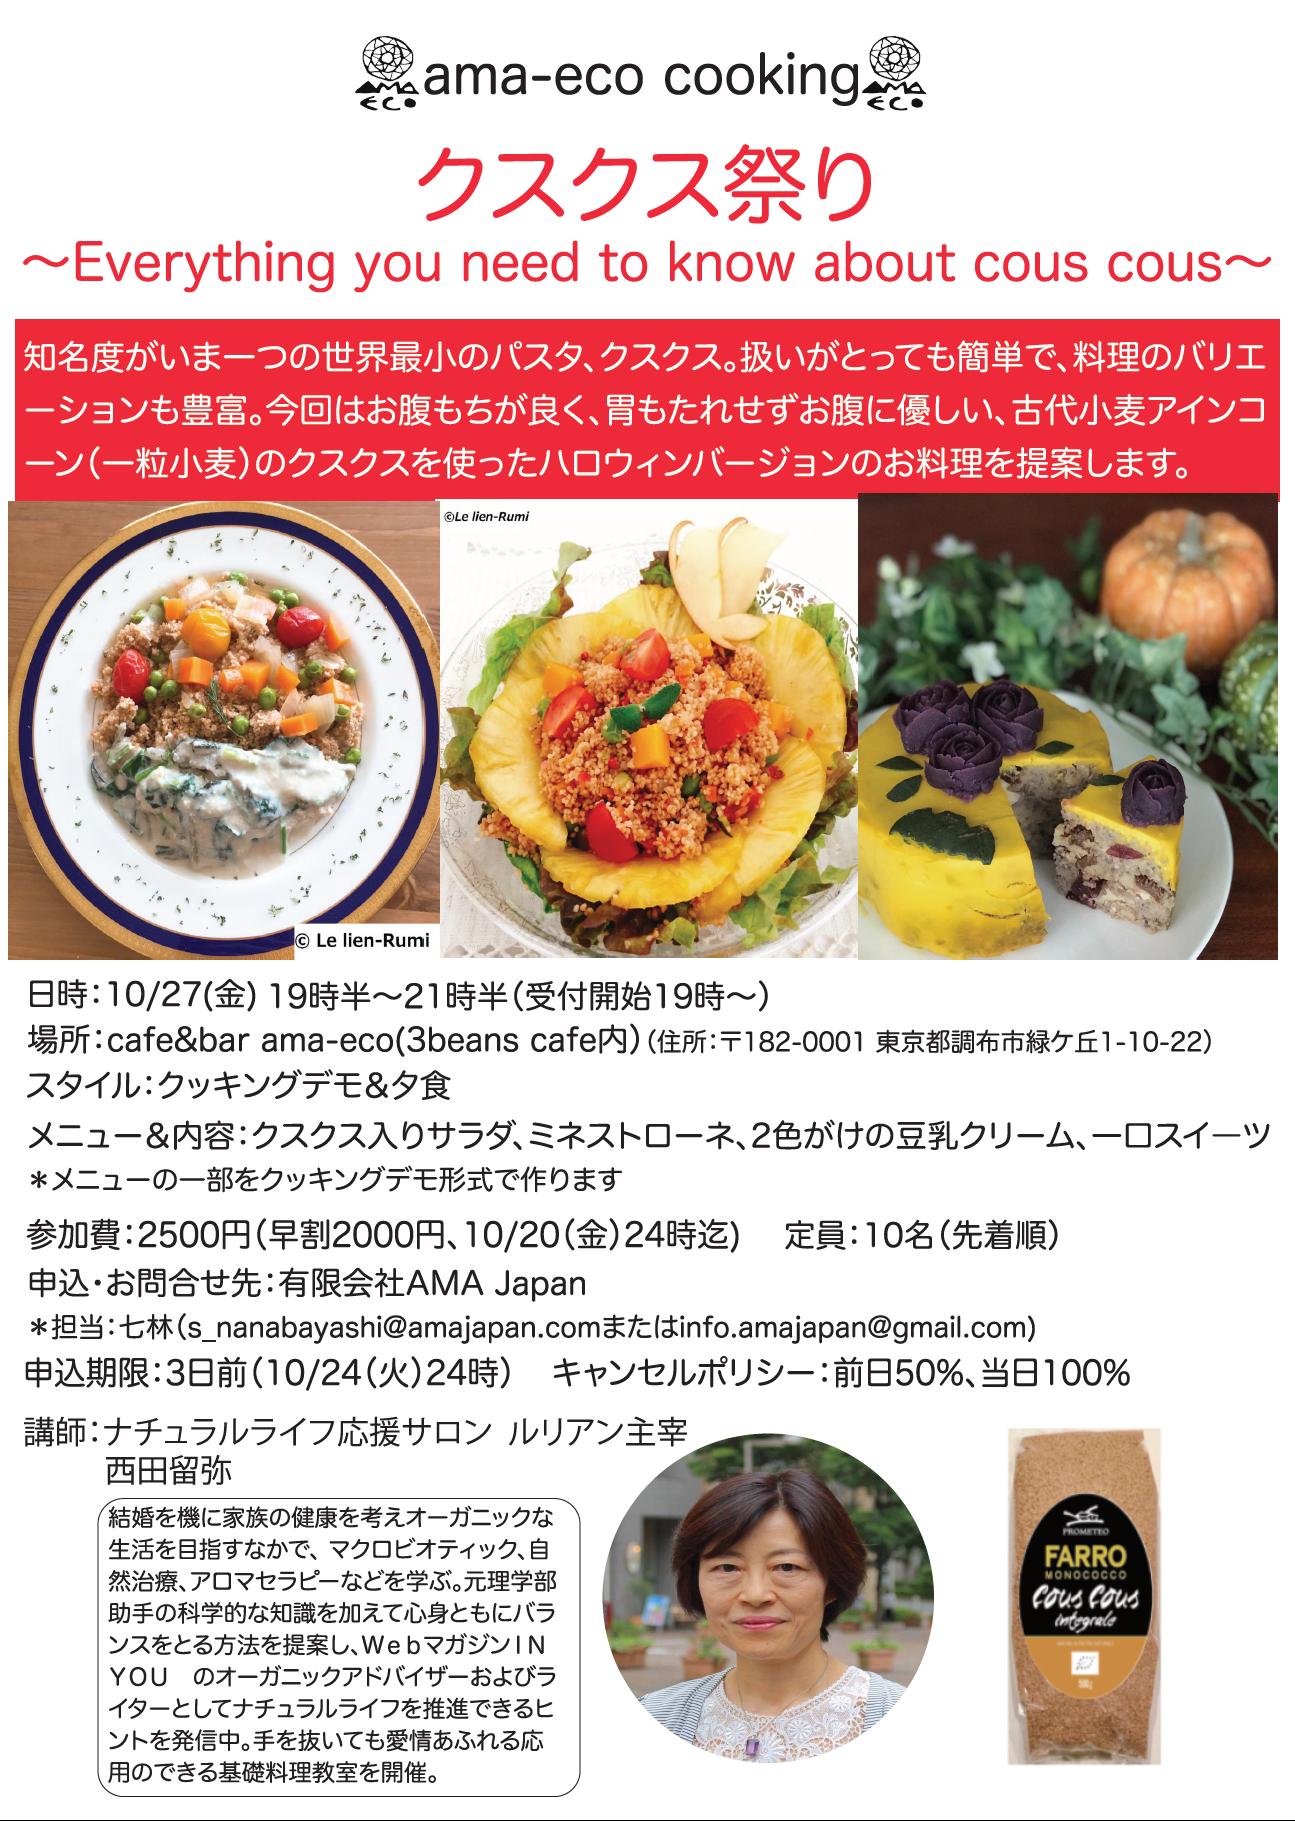 ama-eco cooking クスクス祭り